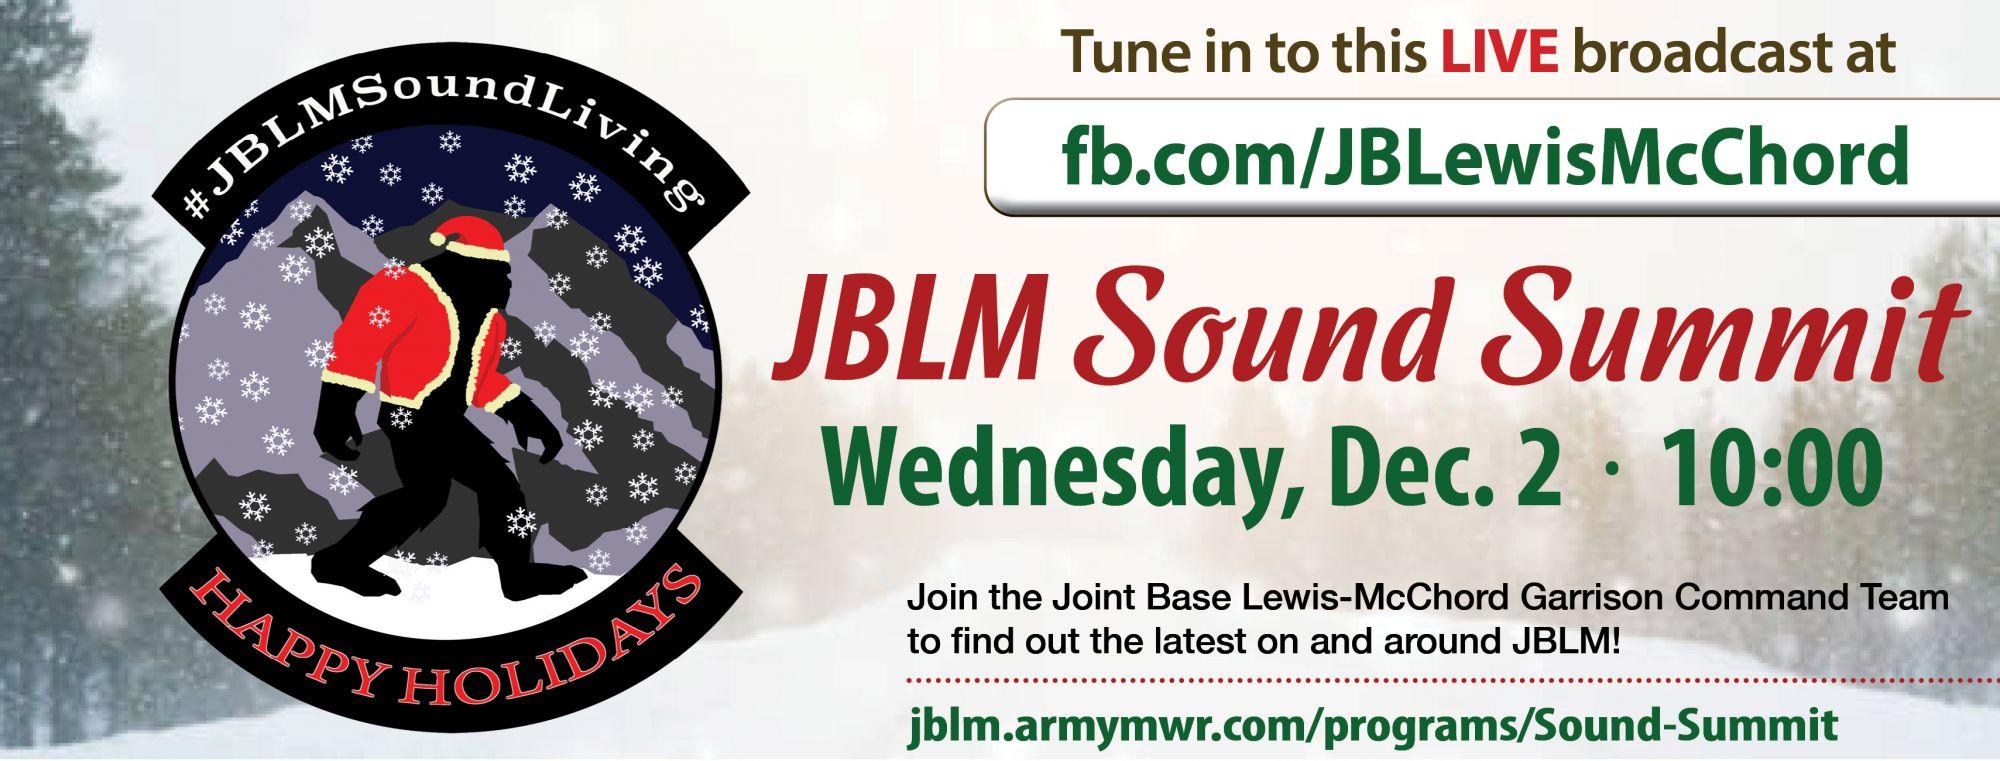 FB-SoundSummit-Banner-Dec2020.jpg